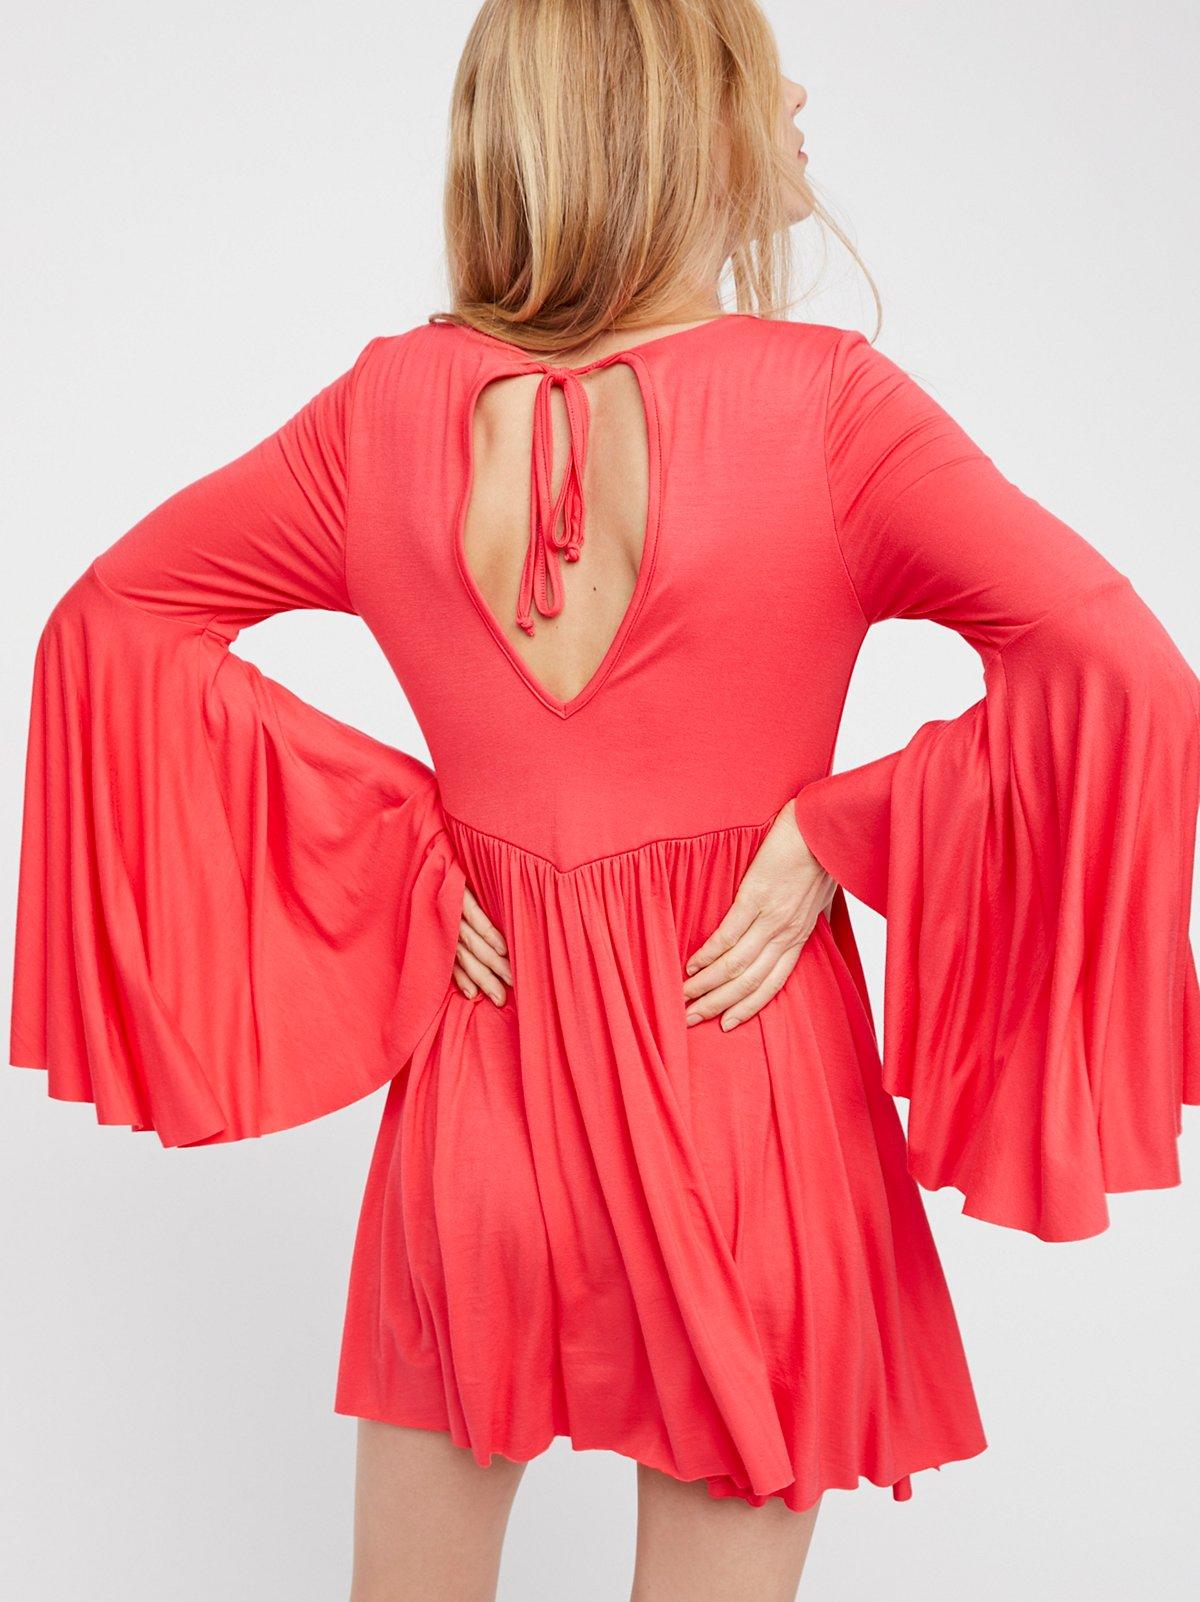 Shop the Camilla Dress